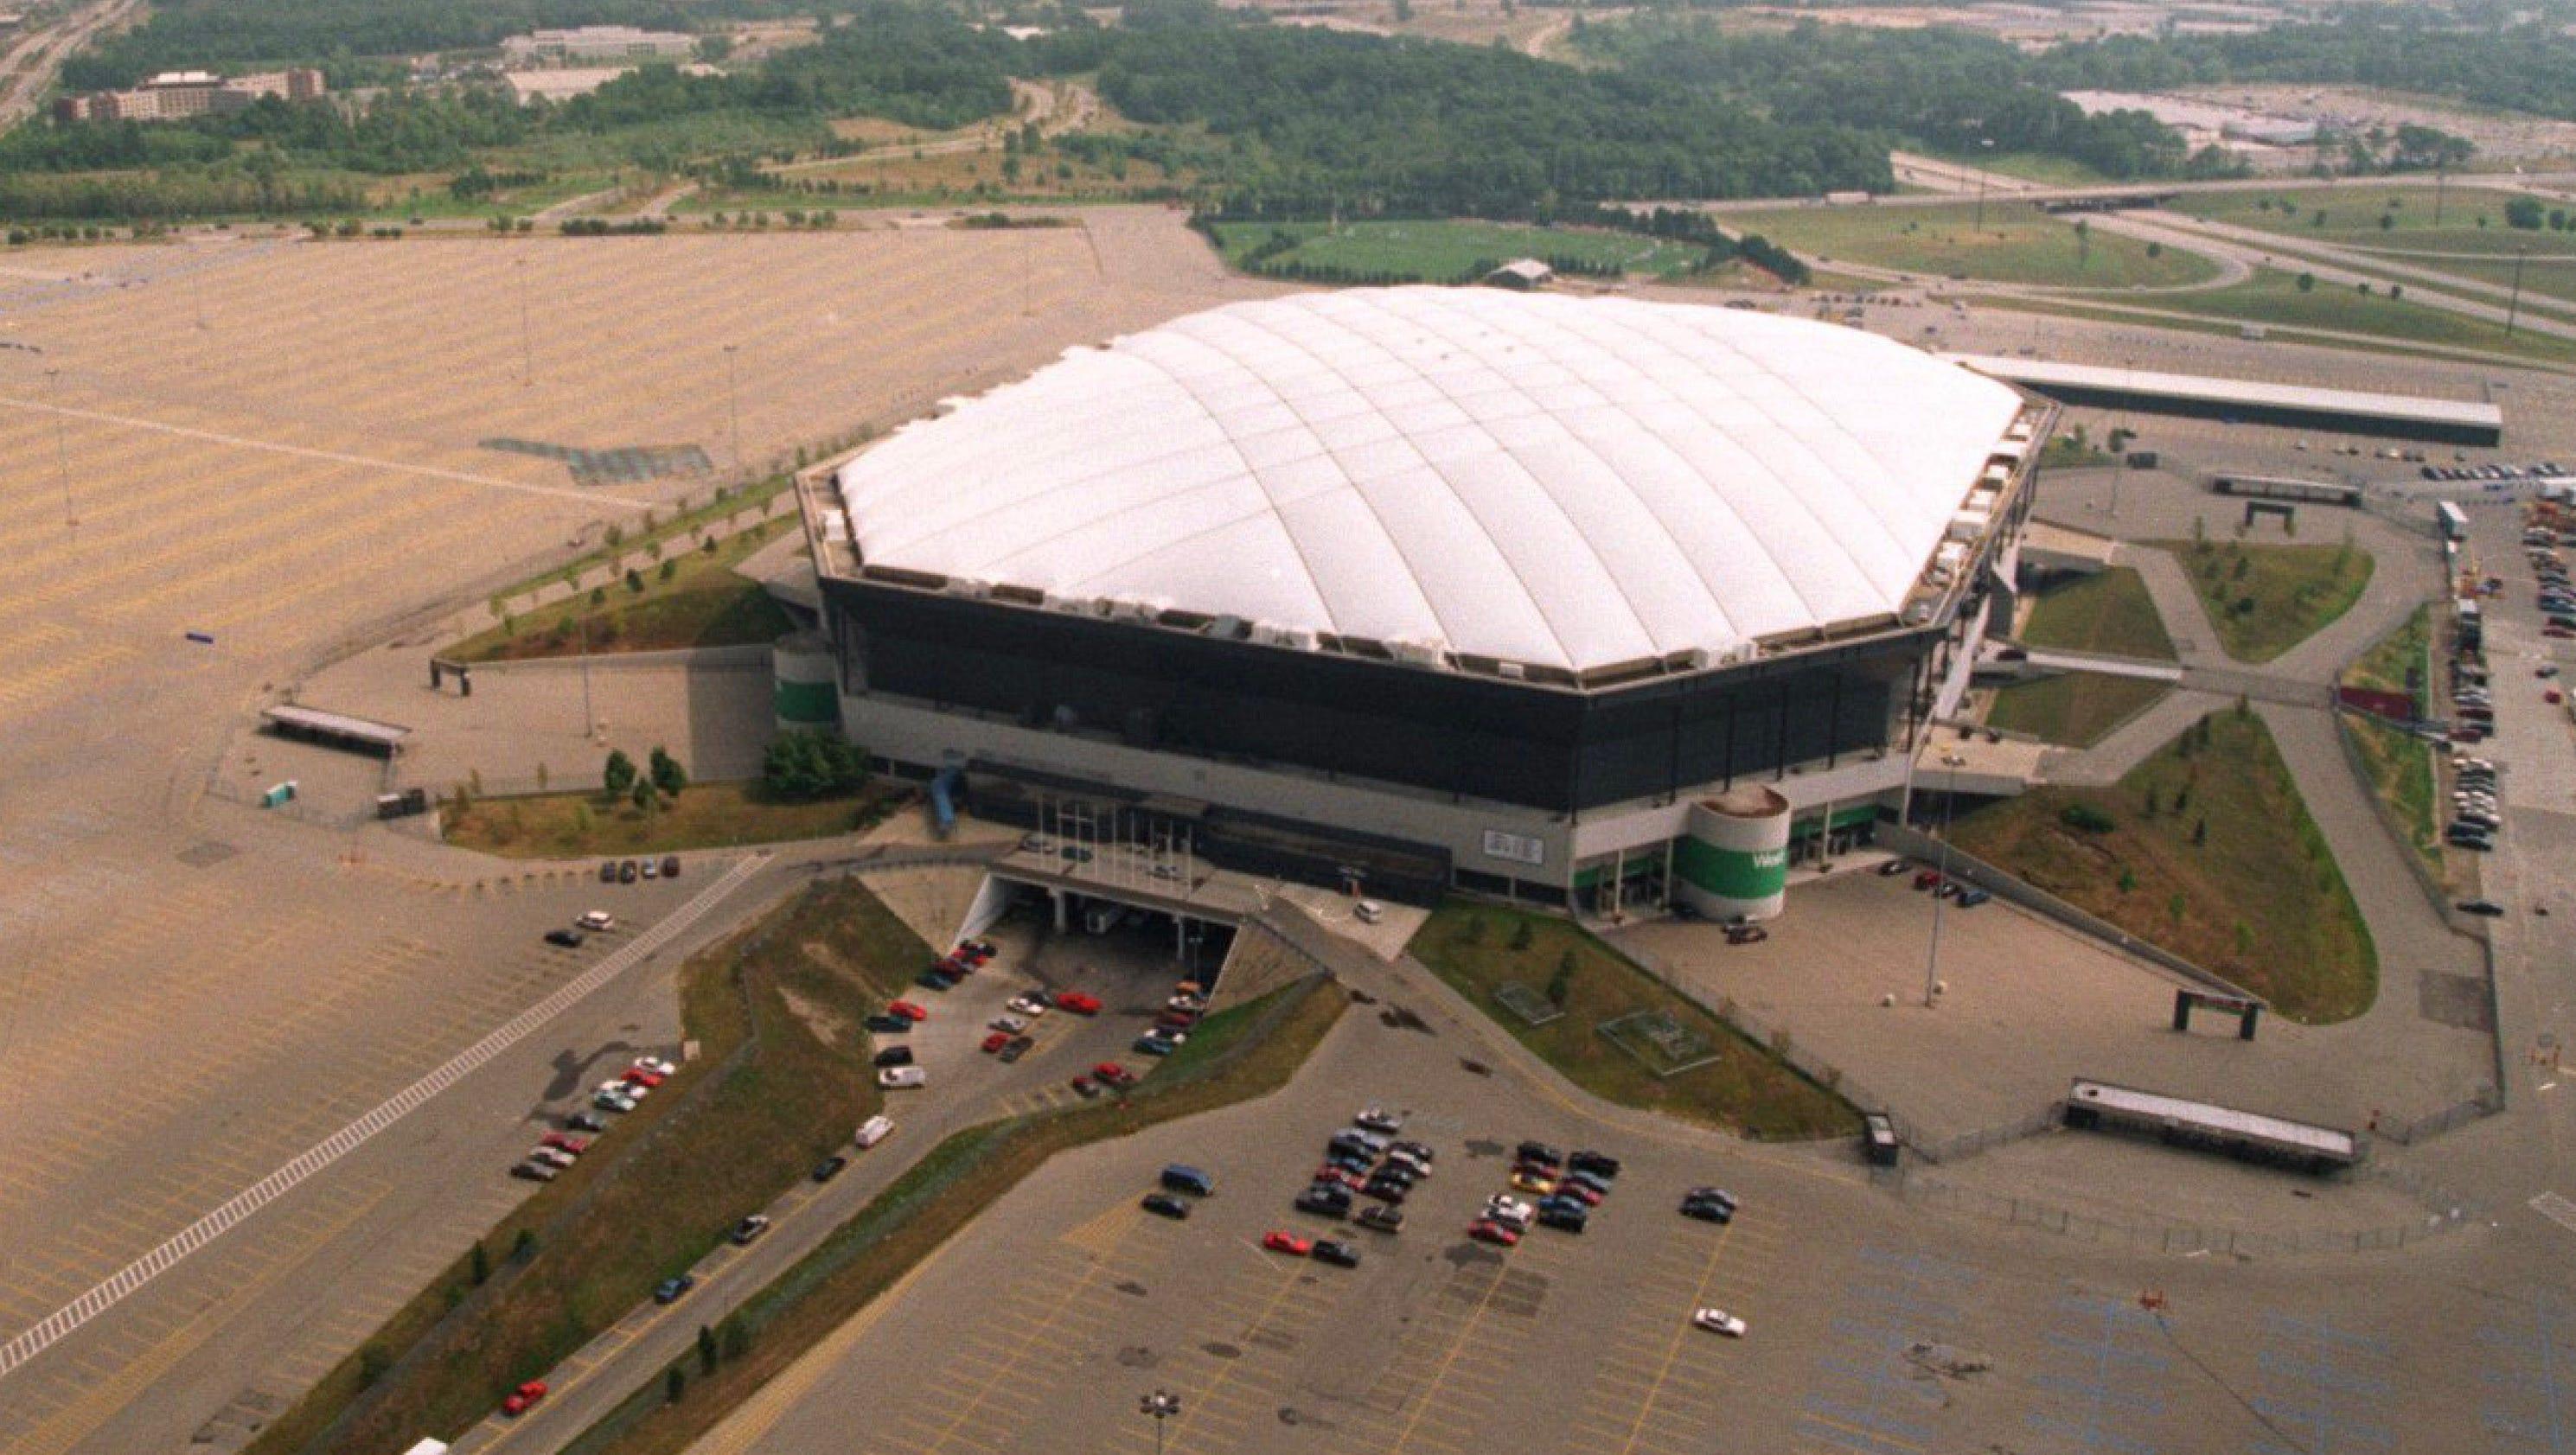 Pontiac Silverdome Explosion Demolition Set To Begin Dec 3